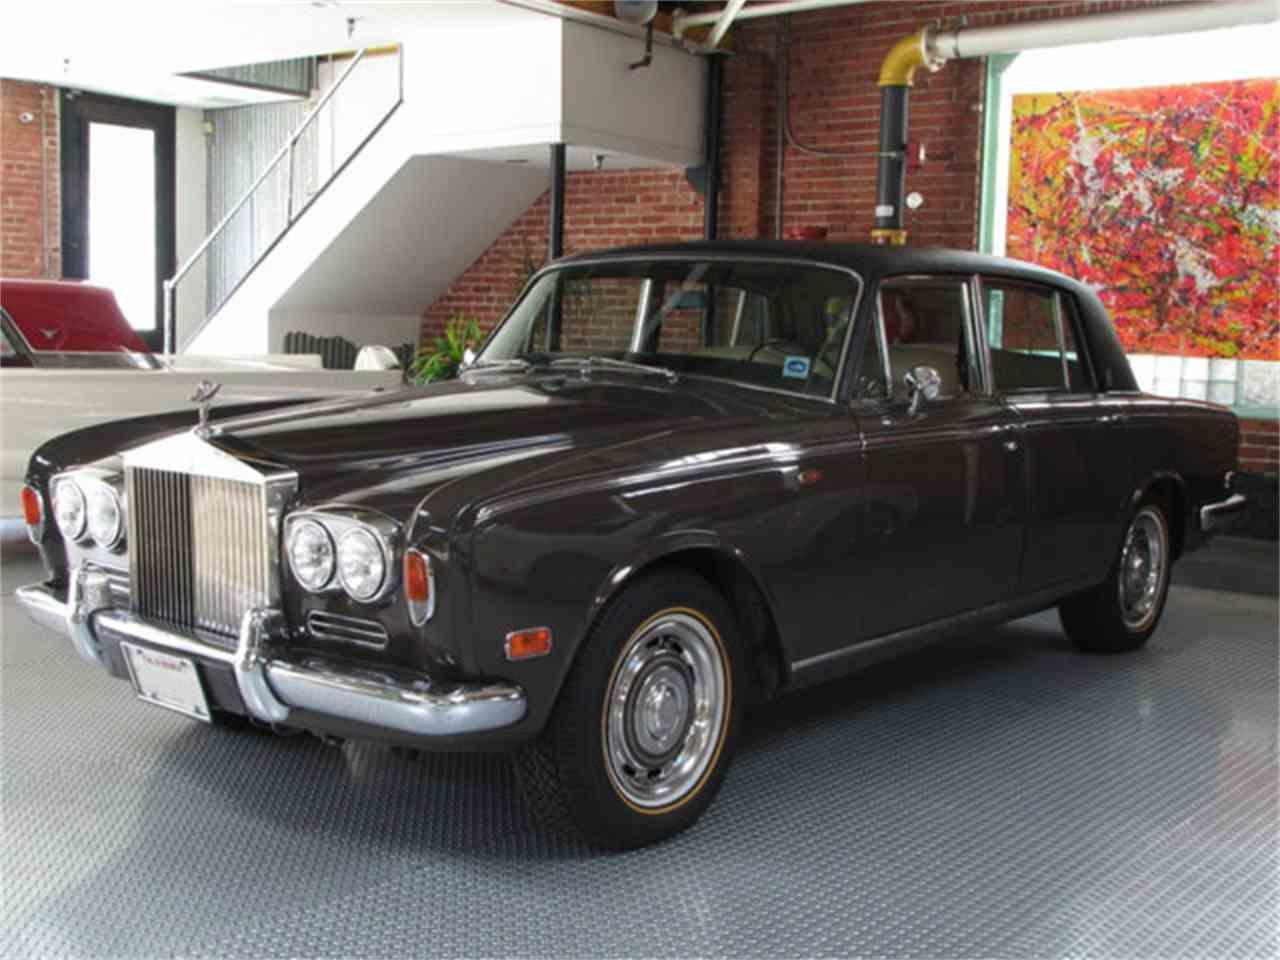 1973 rolls royce silver shadow i for sale cc 973387. Black Bedroom Furniture Sets. Home Design Ideas